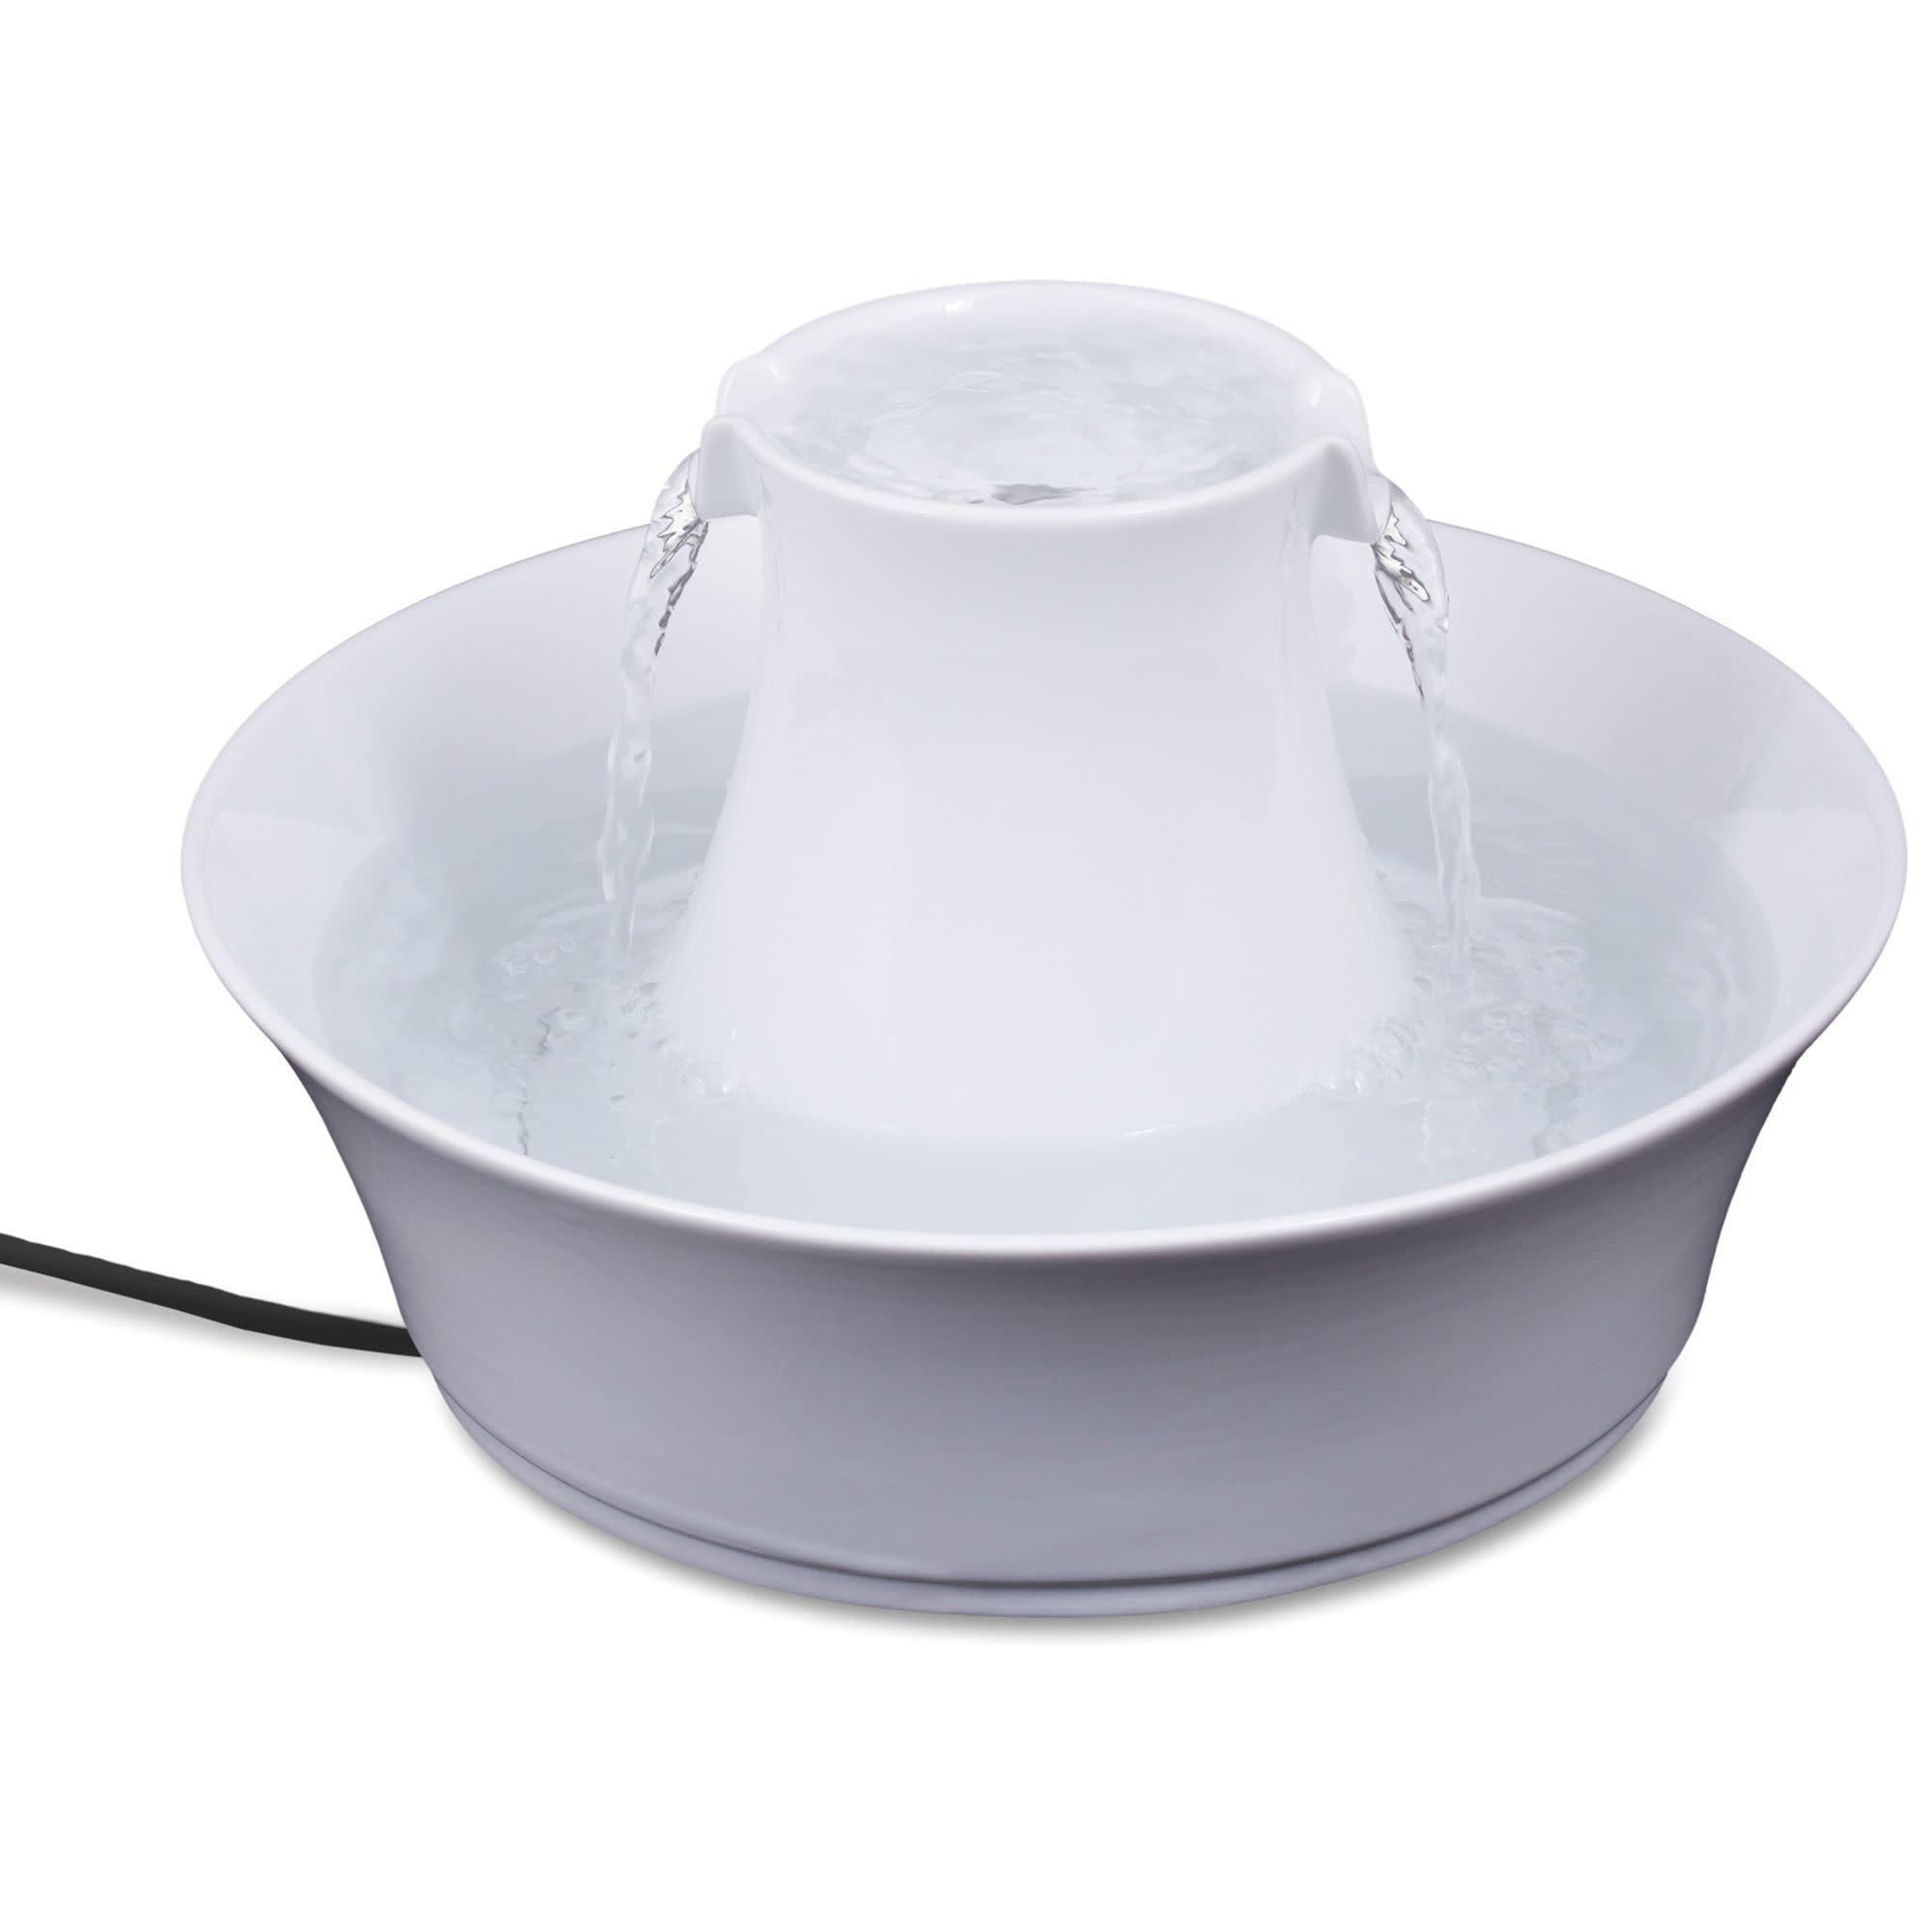 Petsafe- General Drinkwell Porcelain Avalon